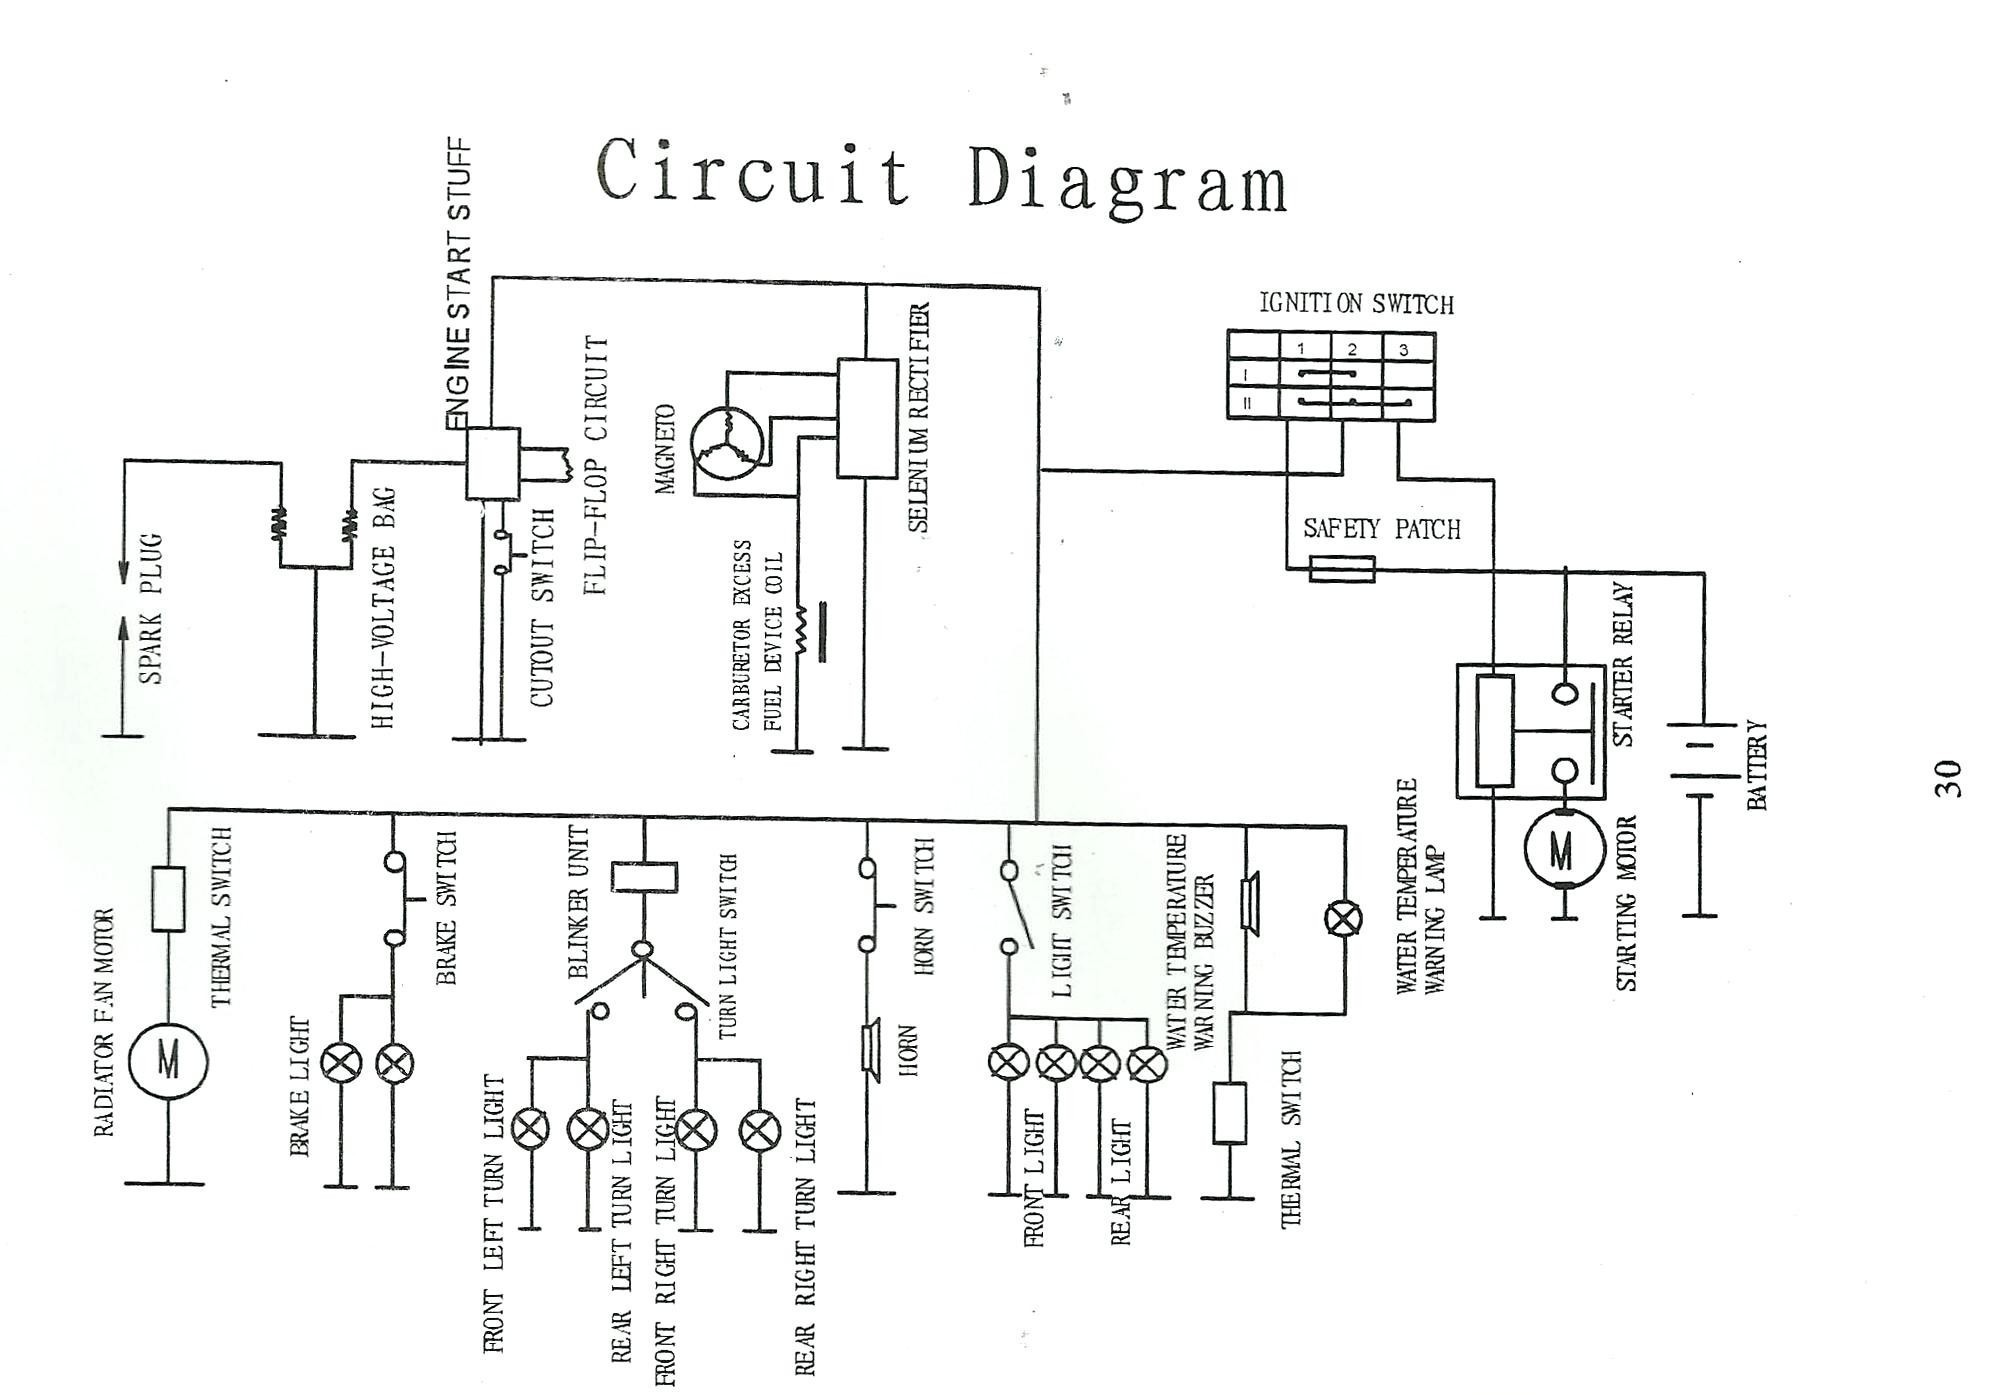 110cc Pocket Bike Wiring Diagram Need